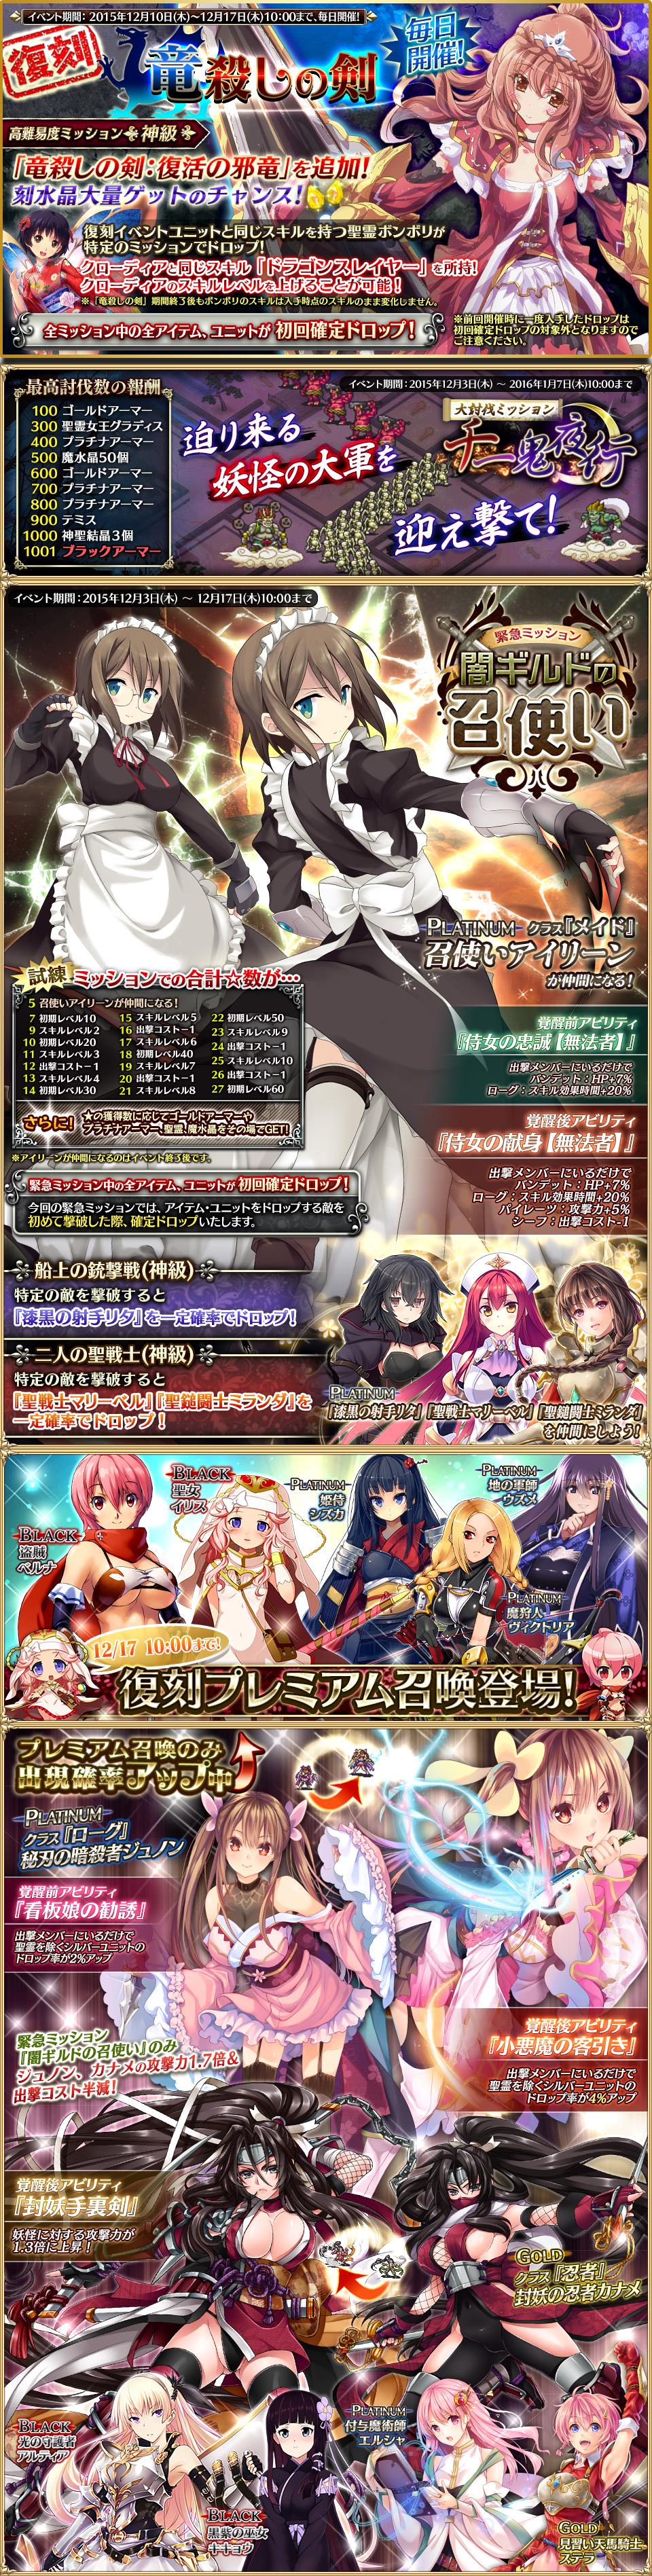 event20151210.jpg